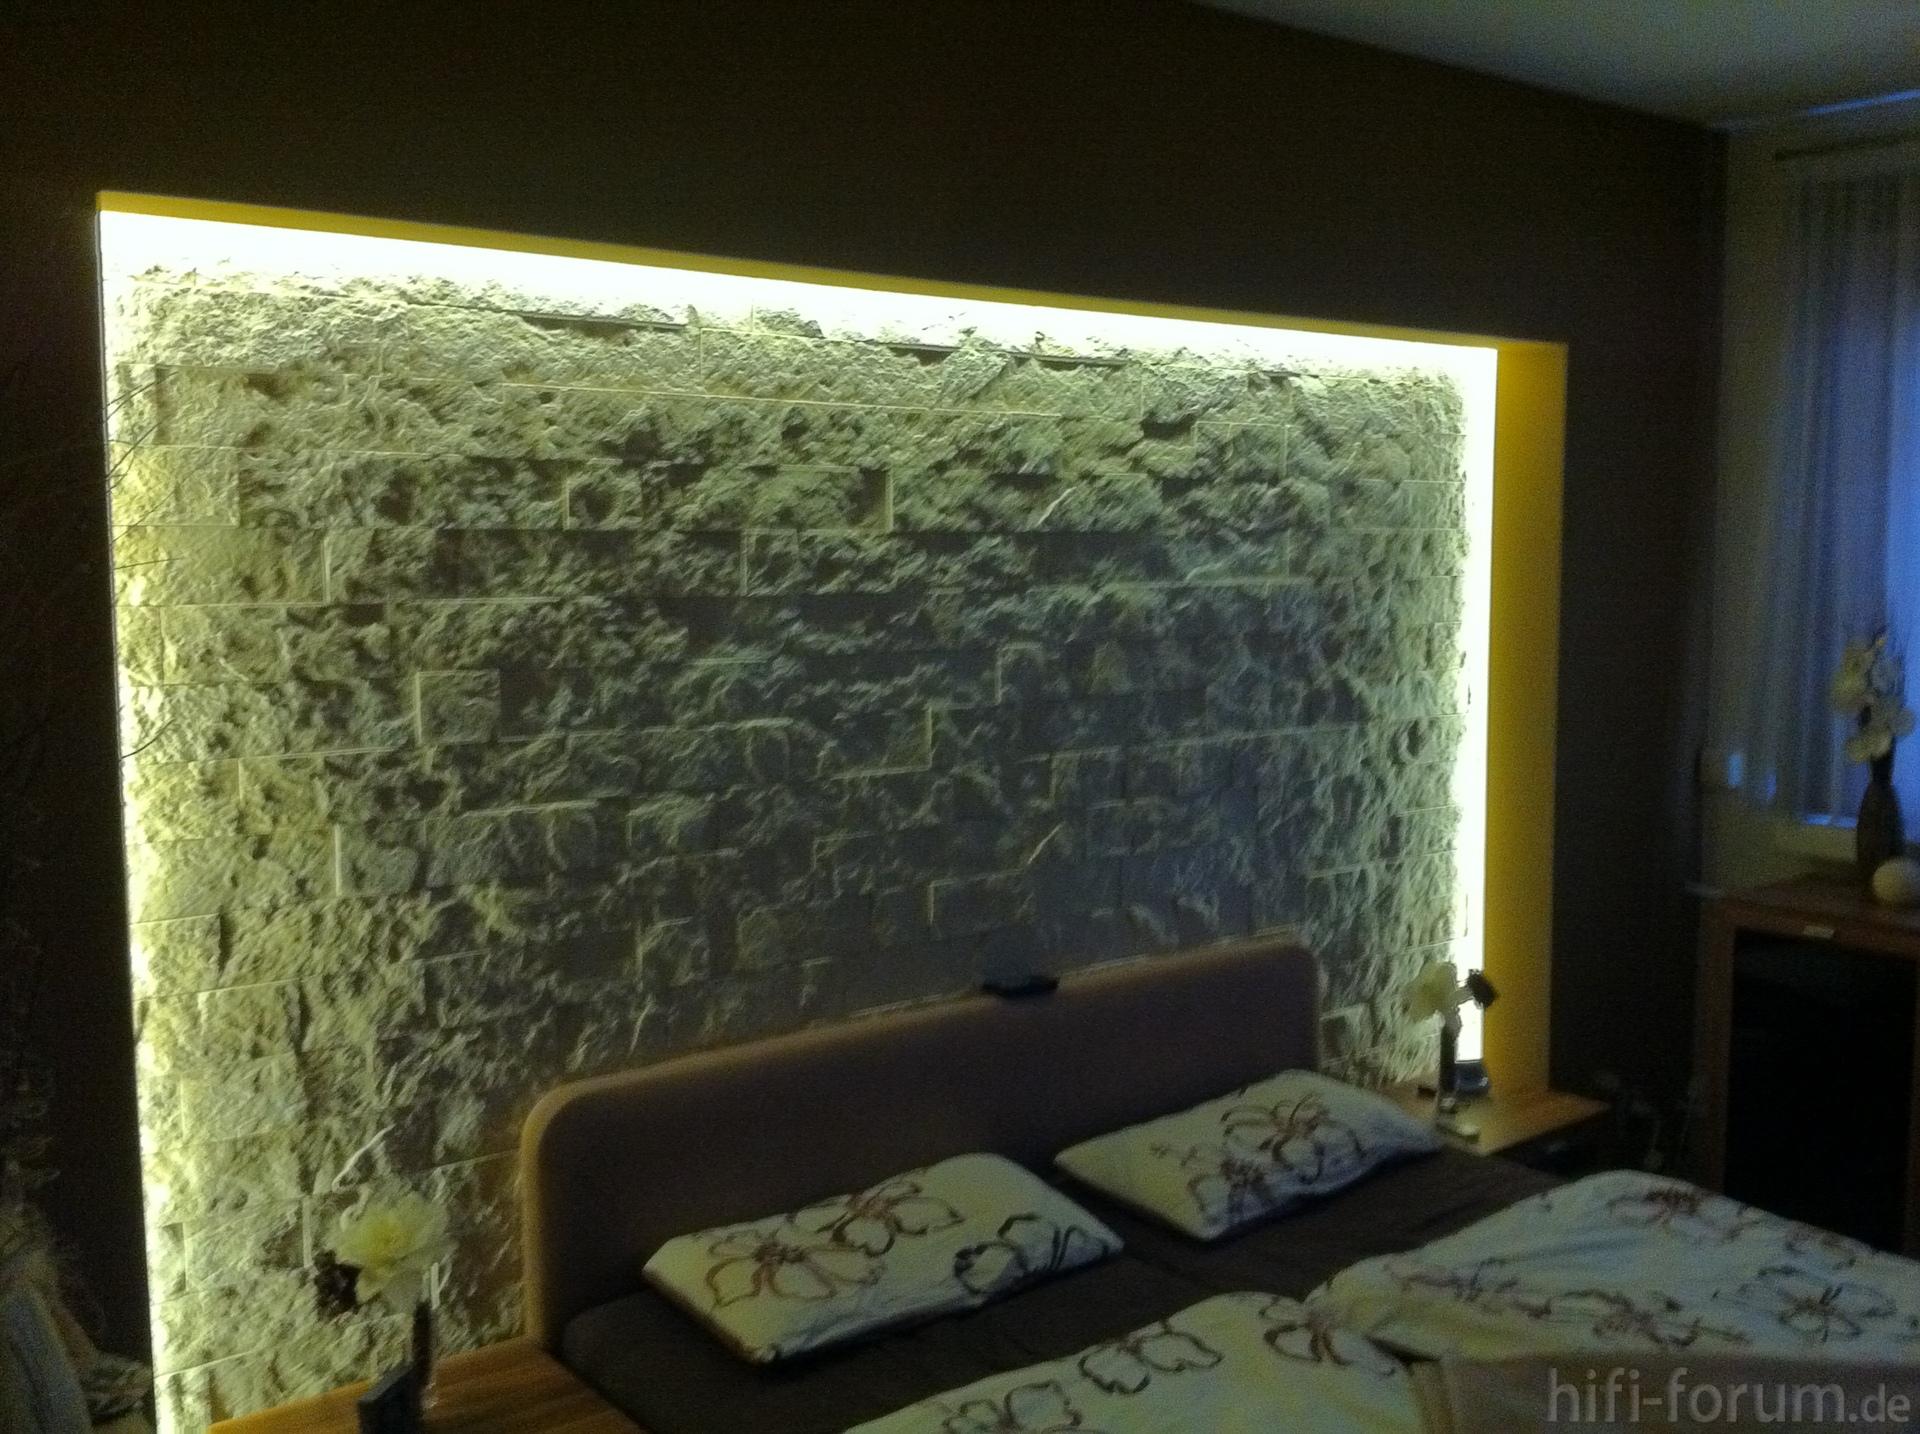 bild 021 doityourself hifi bildergalerie. Black Bedroom Furniture Sets. Home Design Ideas